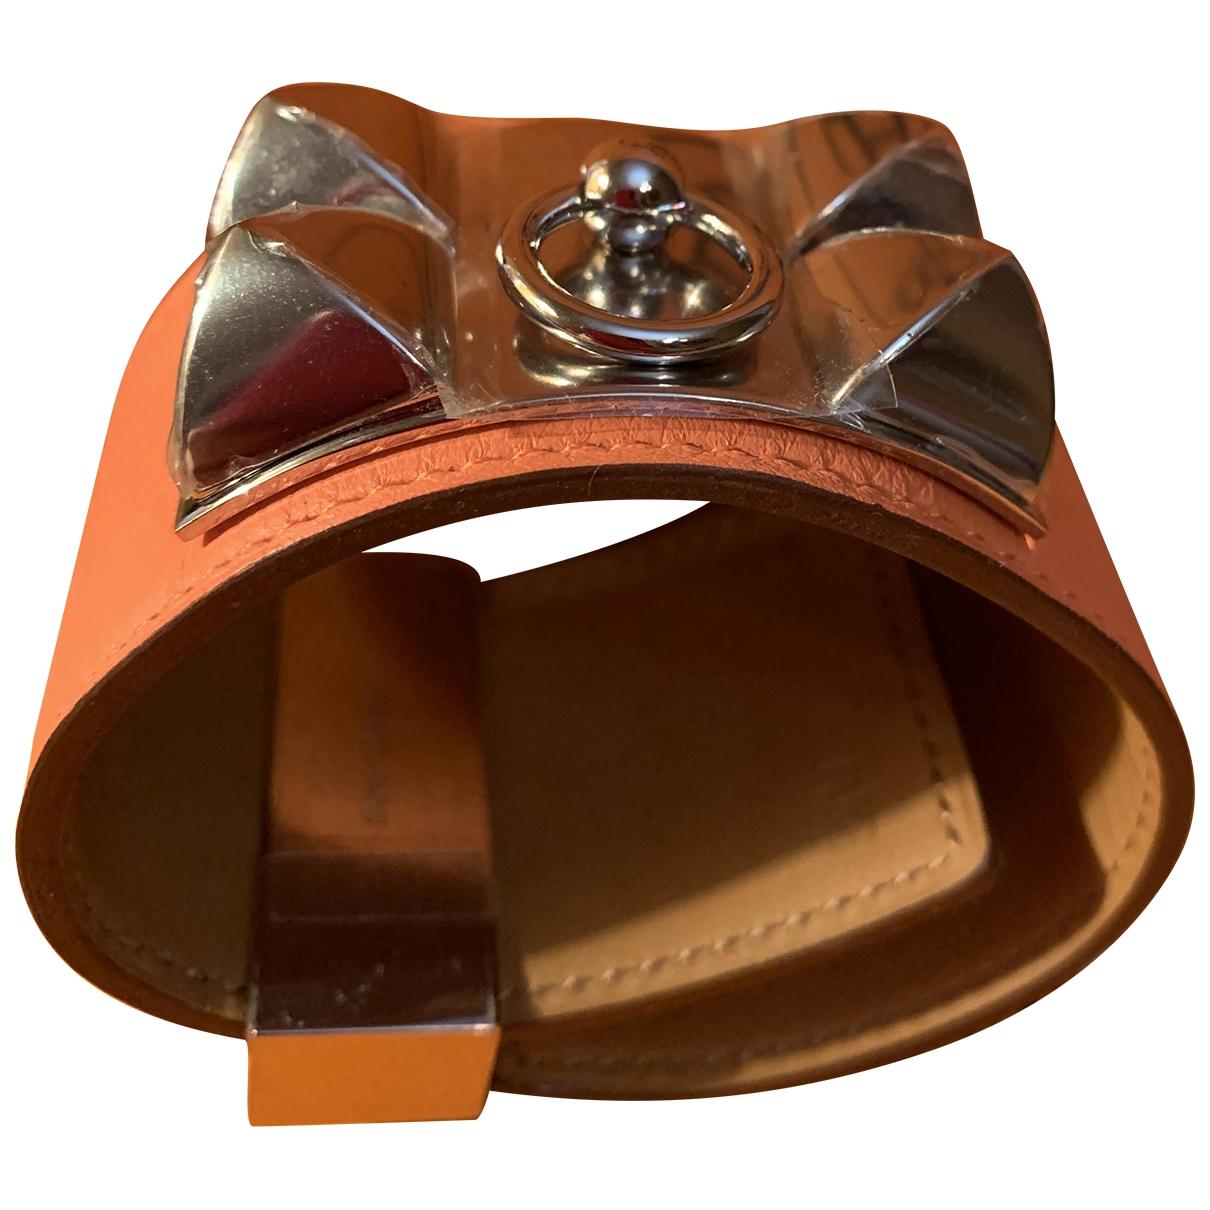 Hermes Collier de chien  Armband in Leder